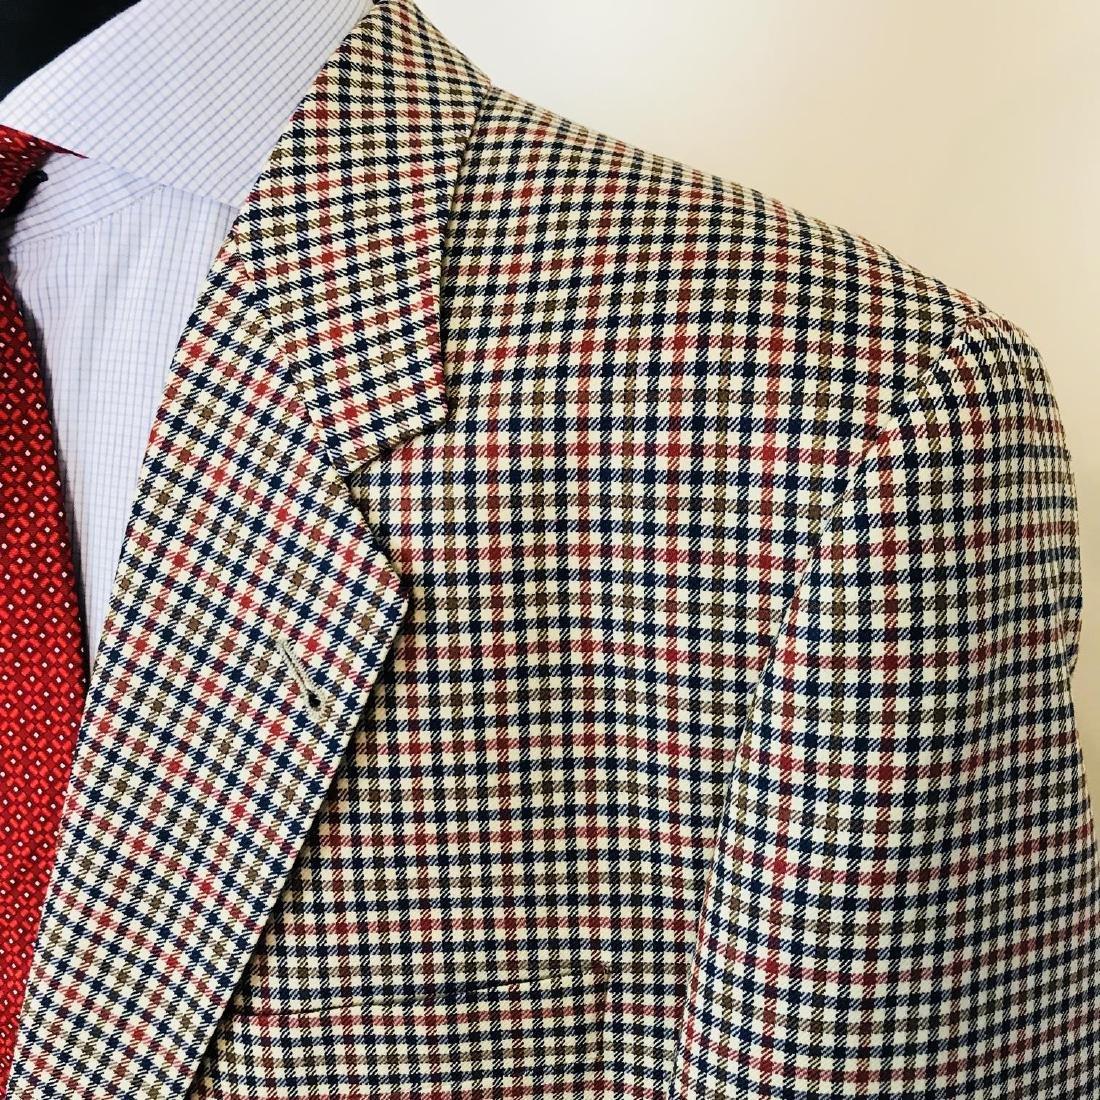 Vintage Men's DESCH Jacket Blazer Size US 46 SHORT - 3